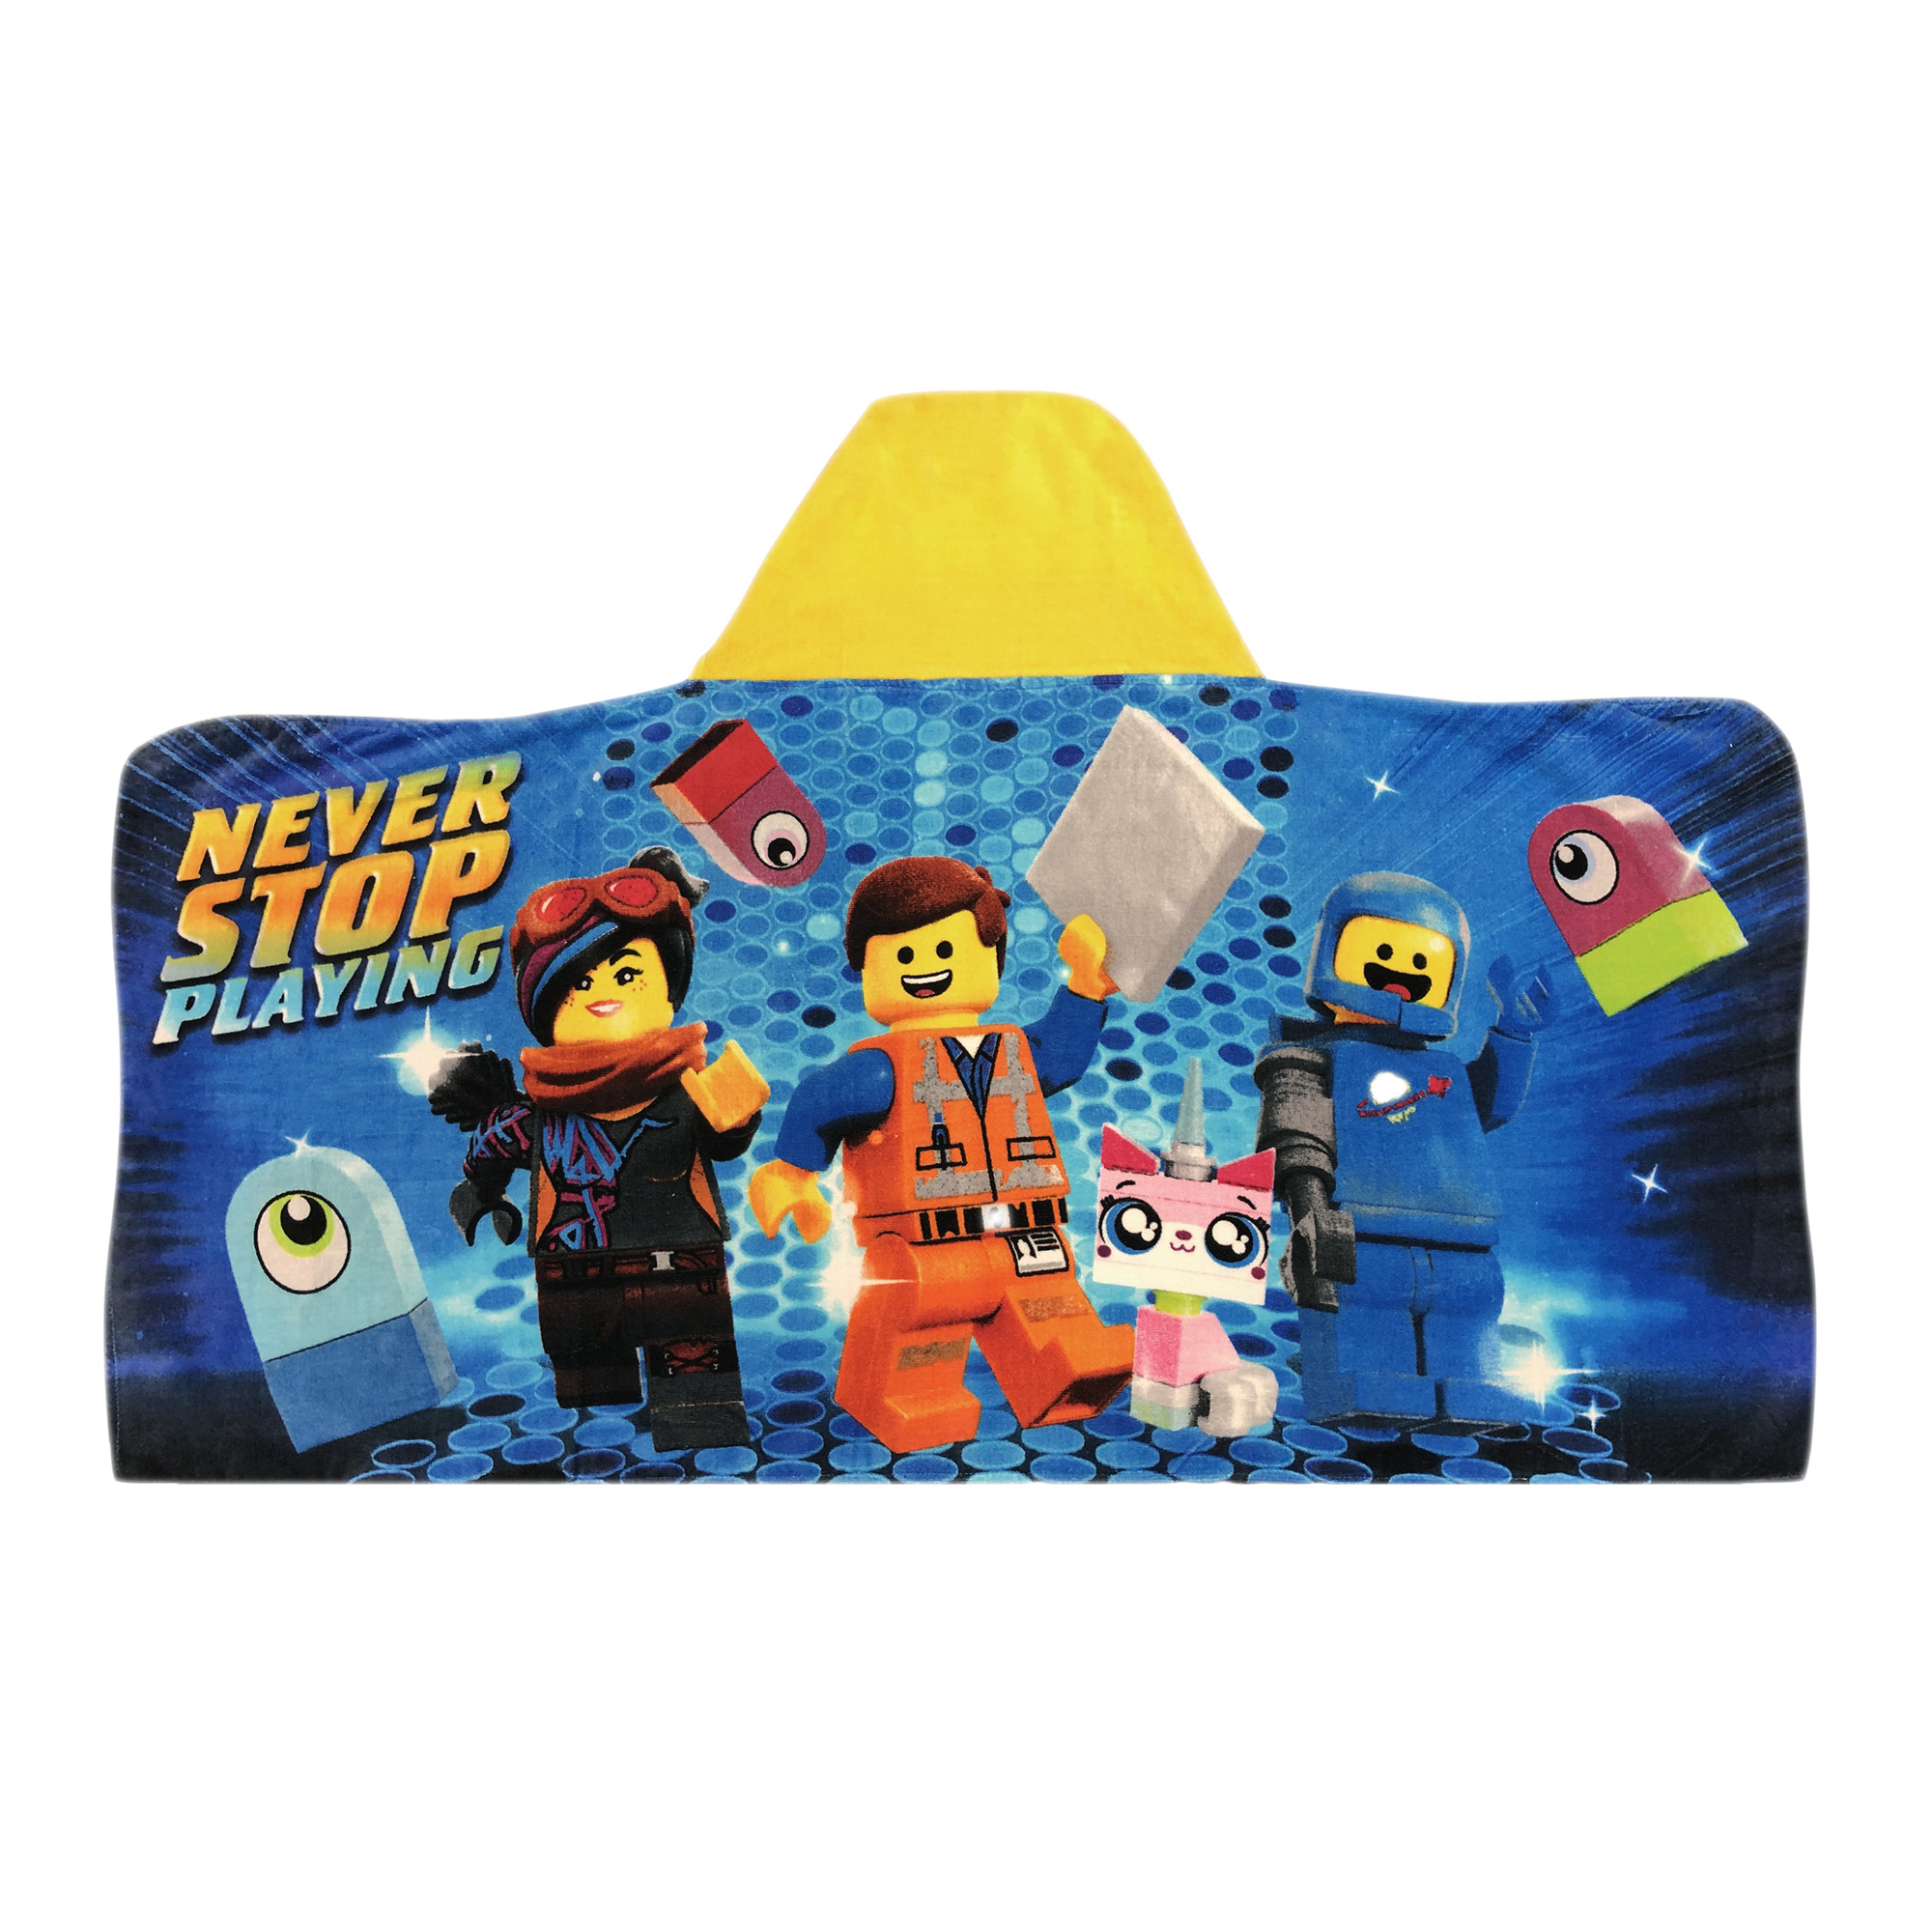 The LEGO Movie 2 Hooded Bath Towel, Kids Bath, Play to Build